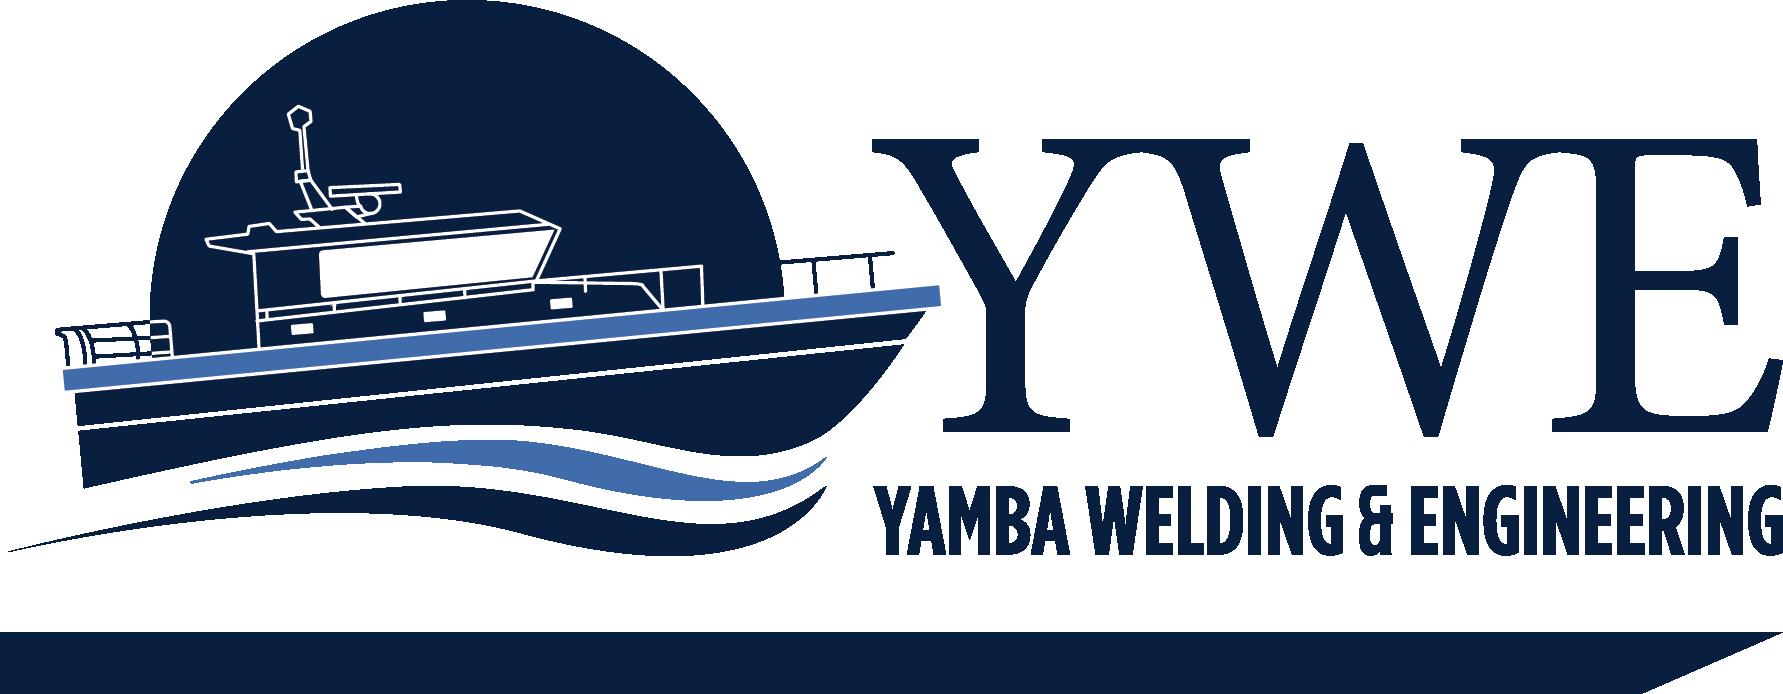 Yamba Welding Website